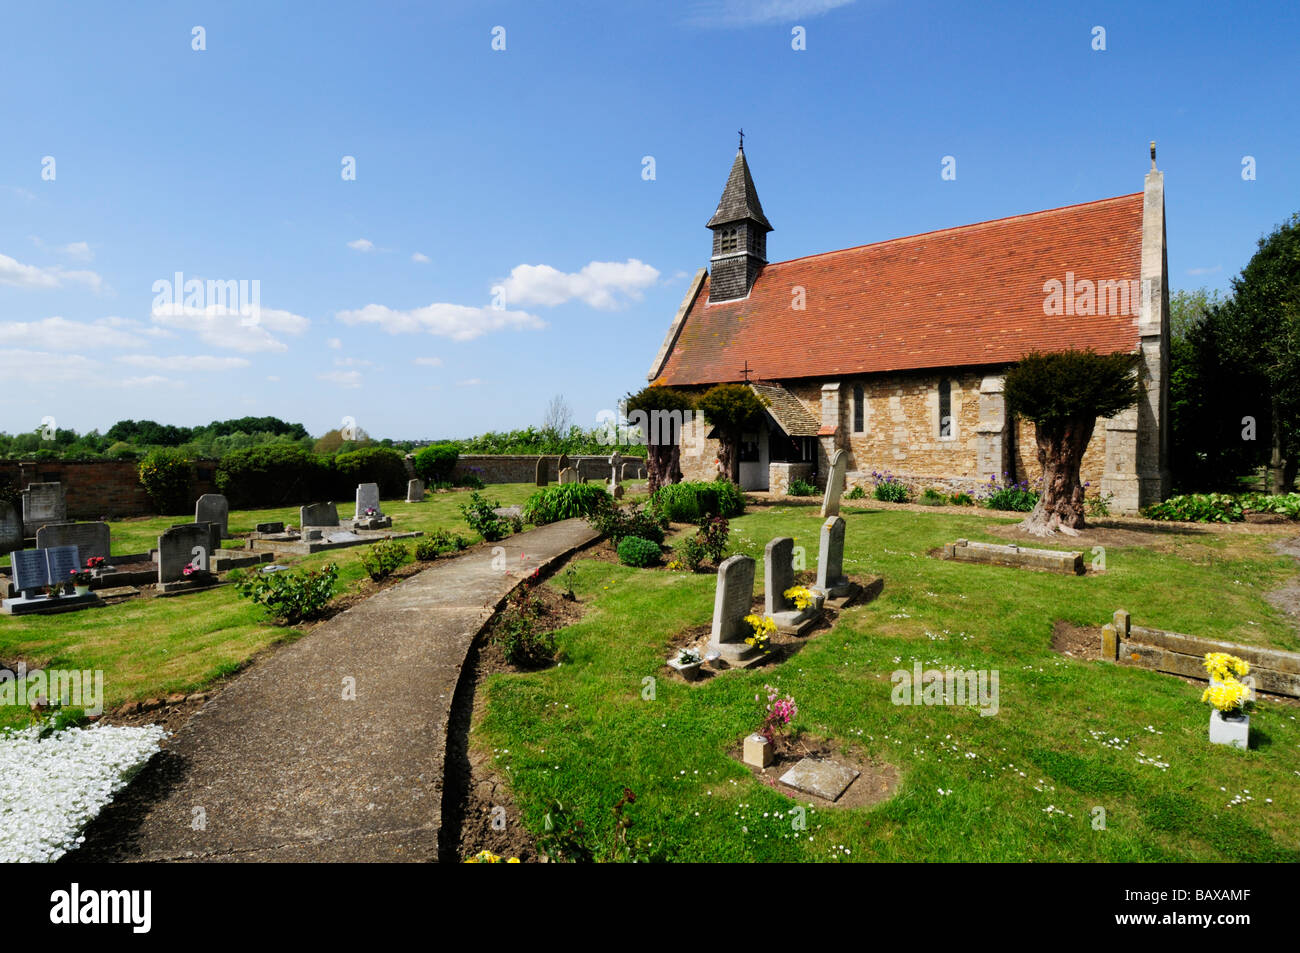 St Michaels Church, Chettisham Cambridgeshire England UK - Stock Image